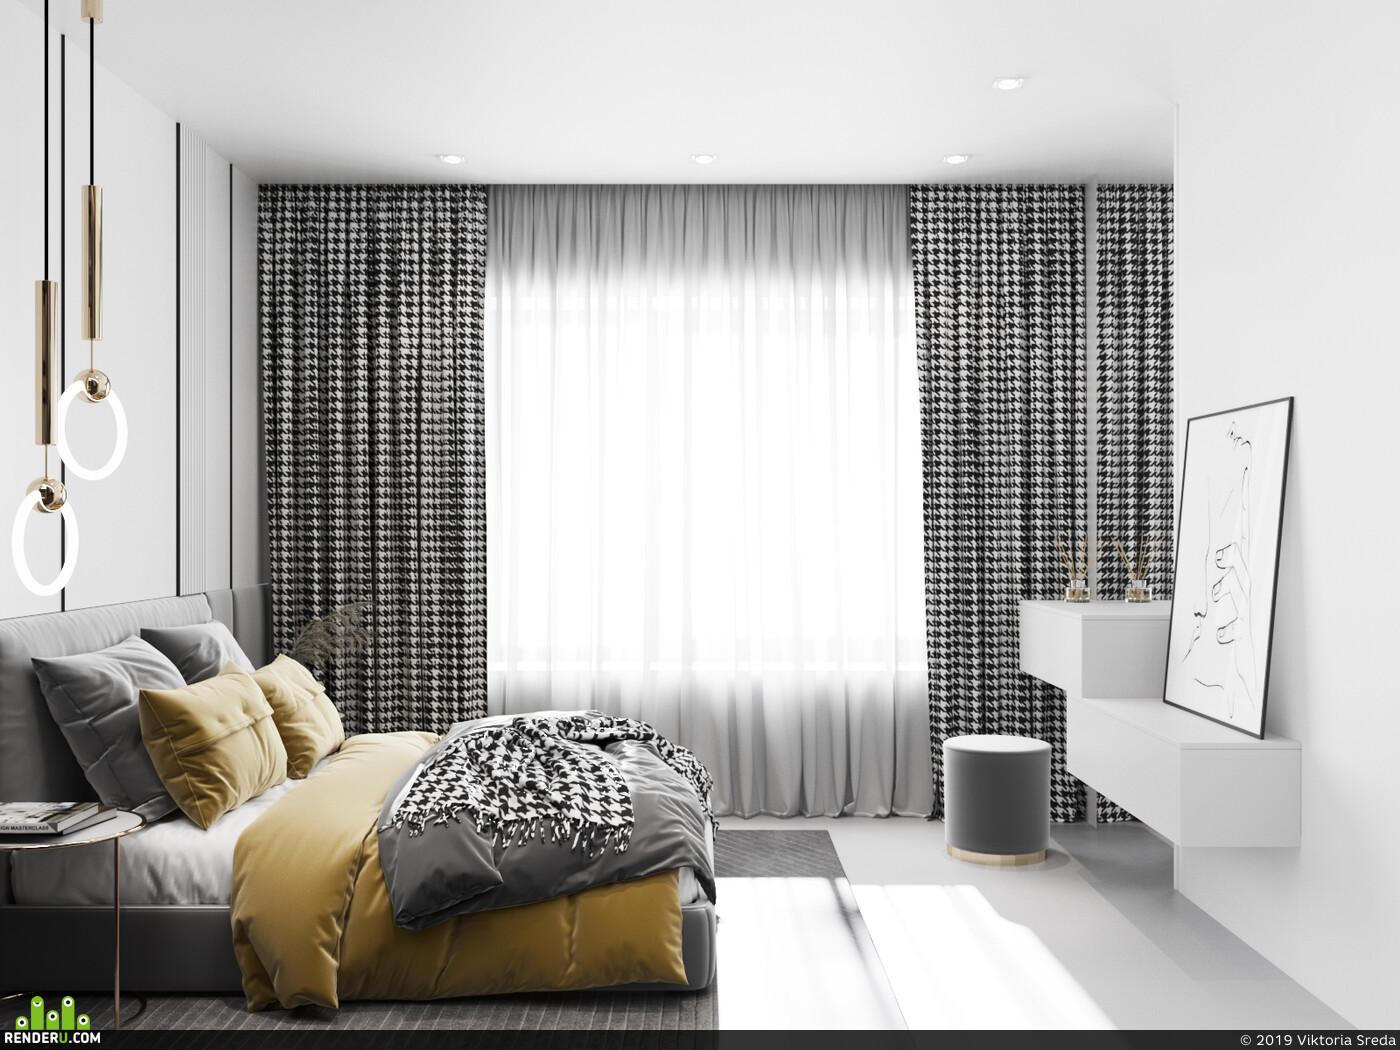 Corona Renderer, 3ds Max, Adobe Photoshop, интерьер, Визуализация